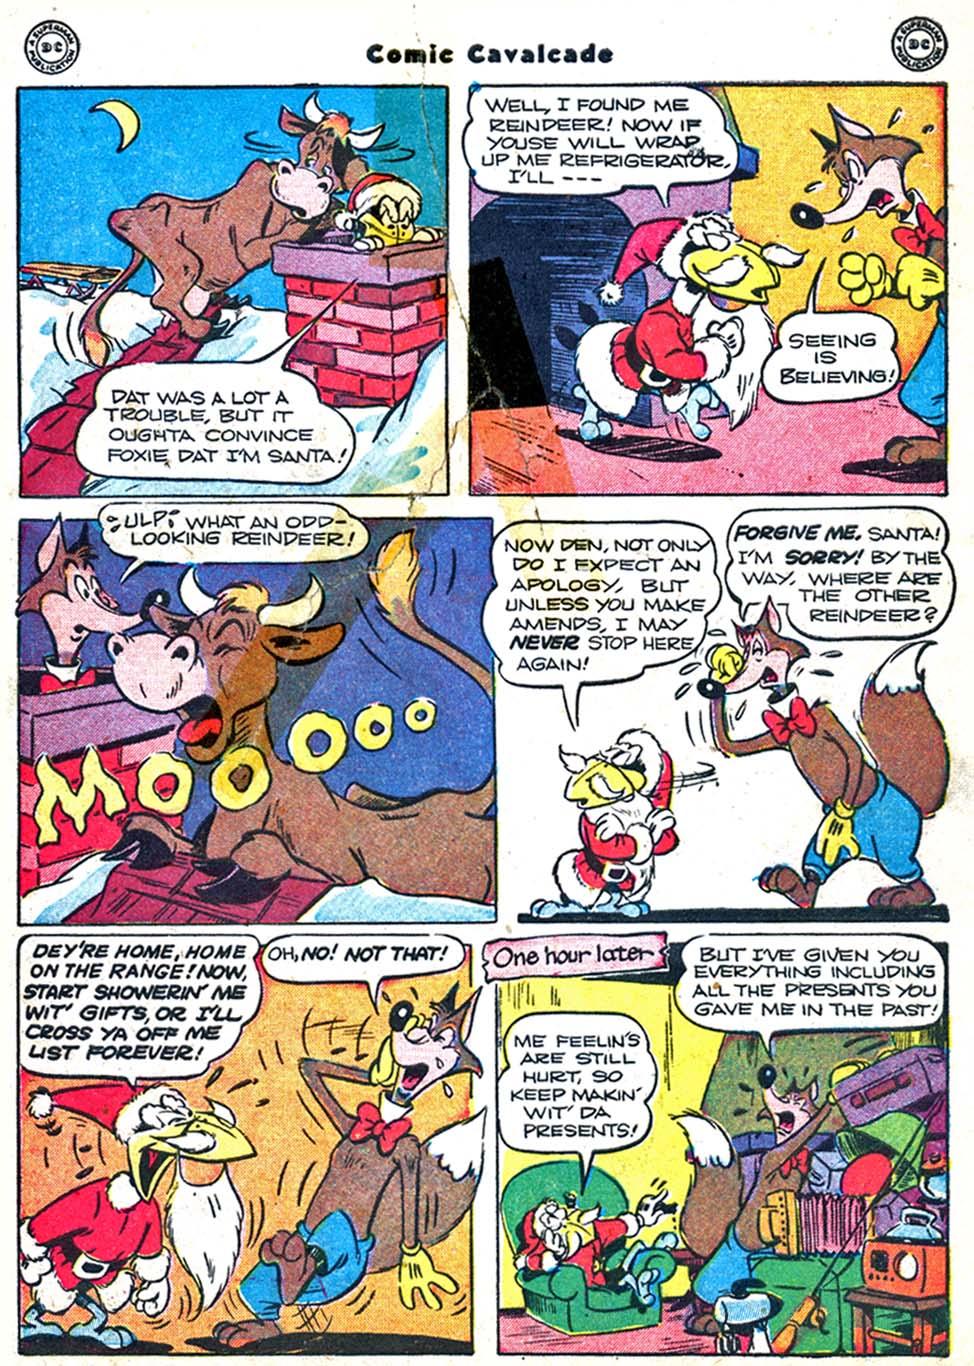 Comic Cavalcade issue 31 - Page 9